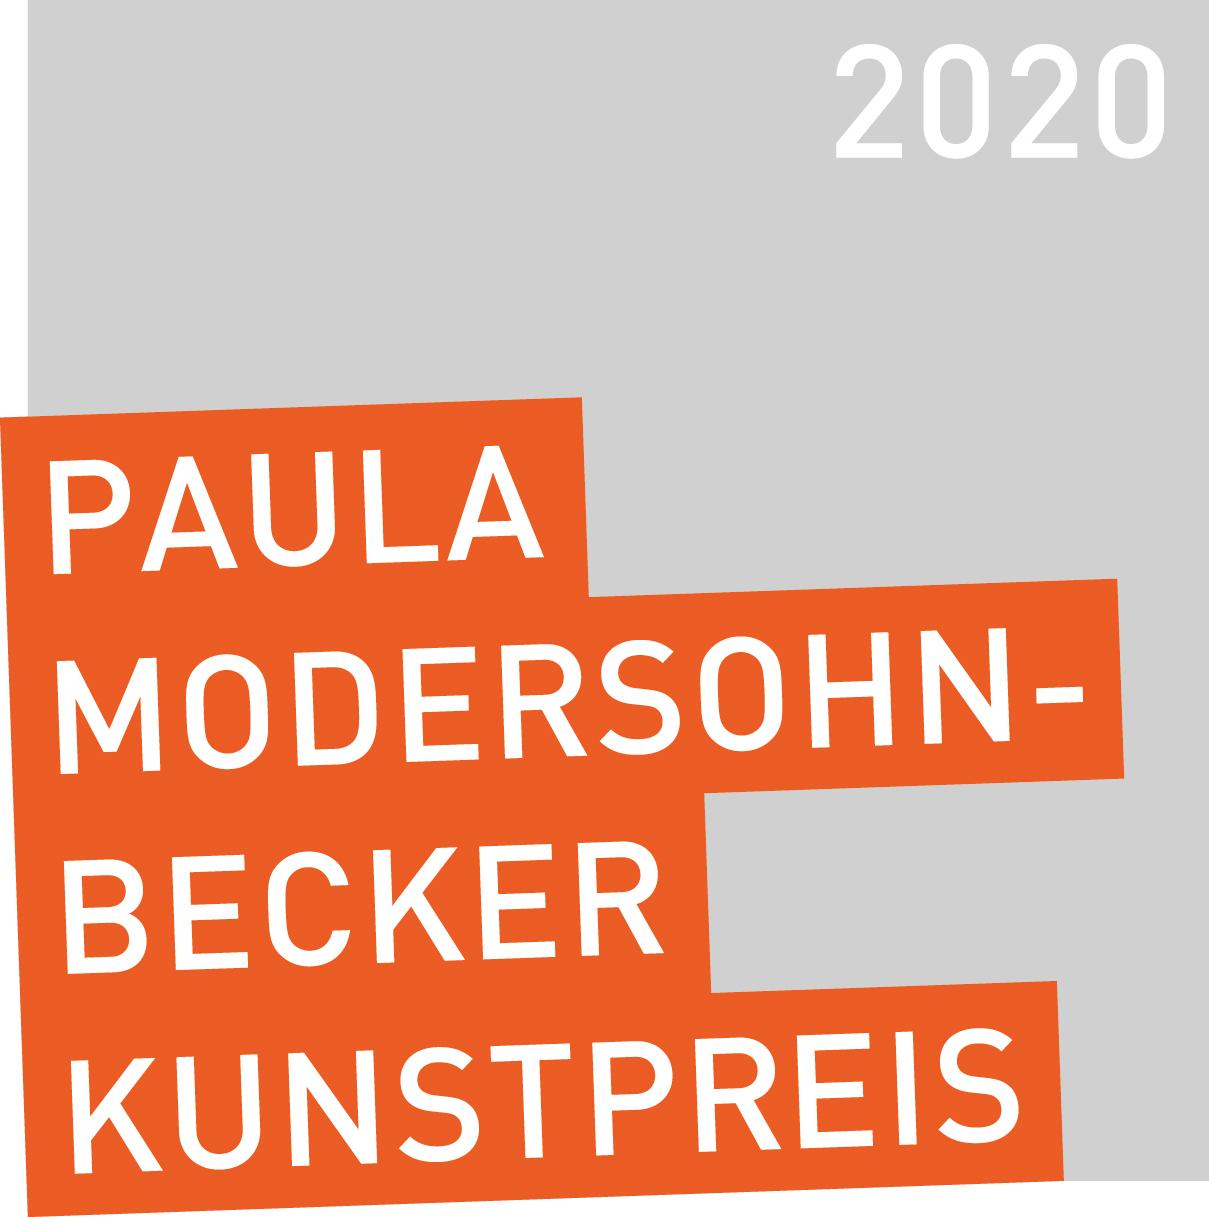 PMB Kunstpreis